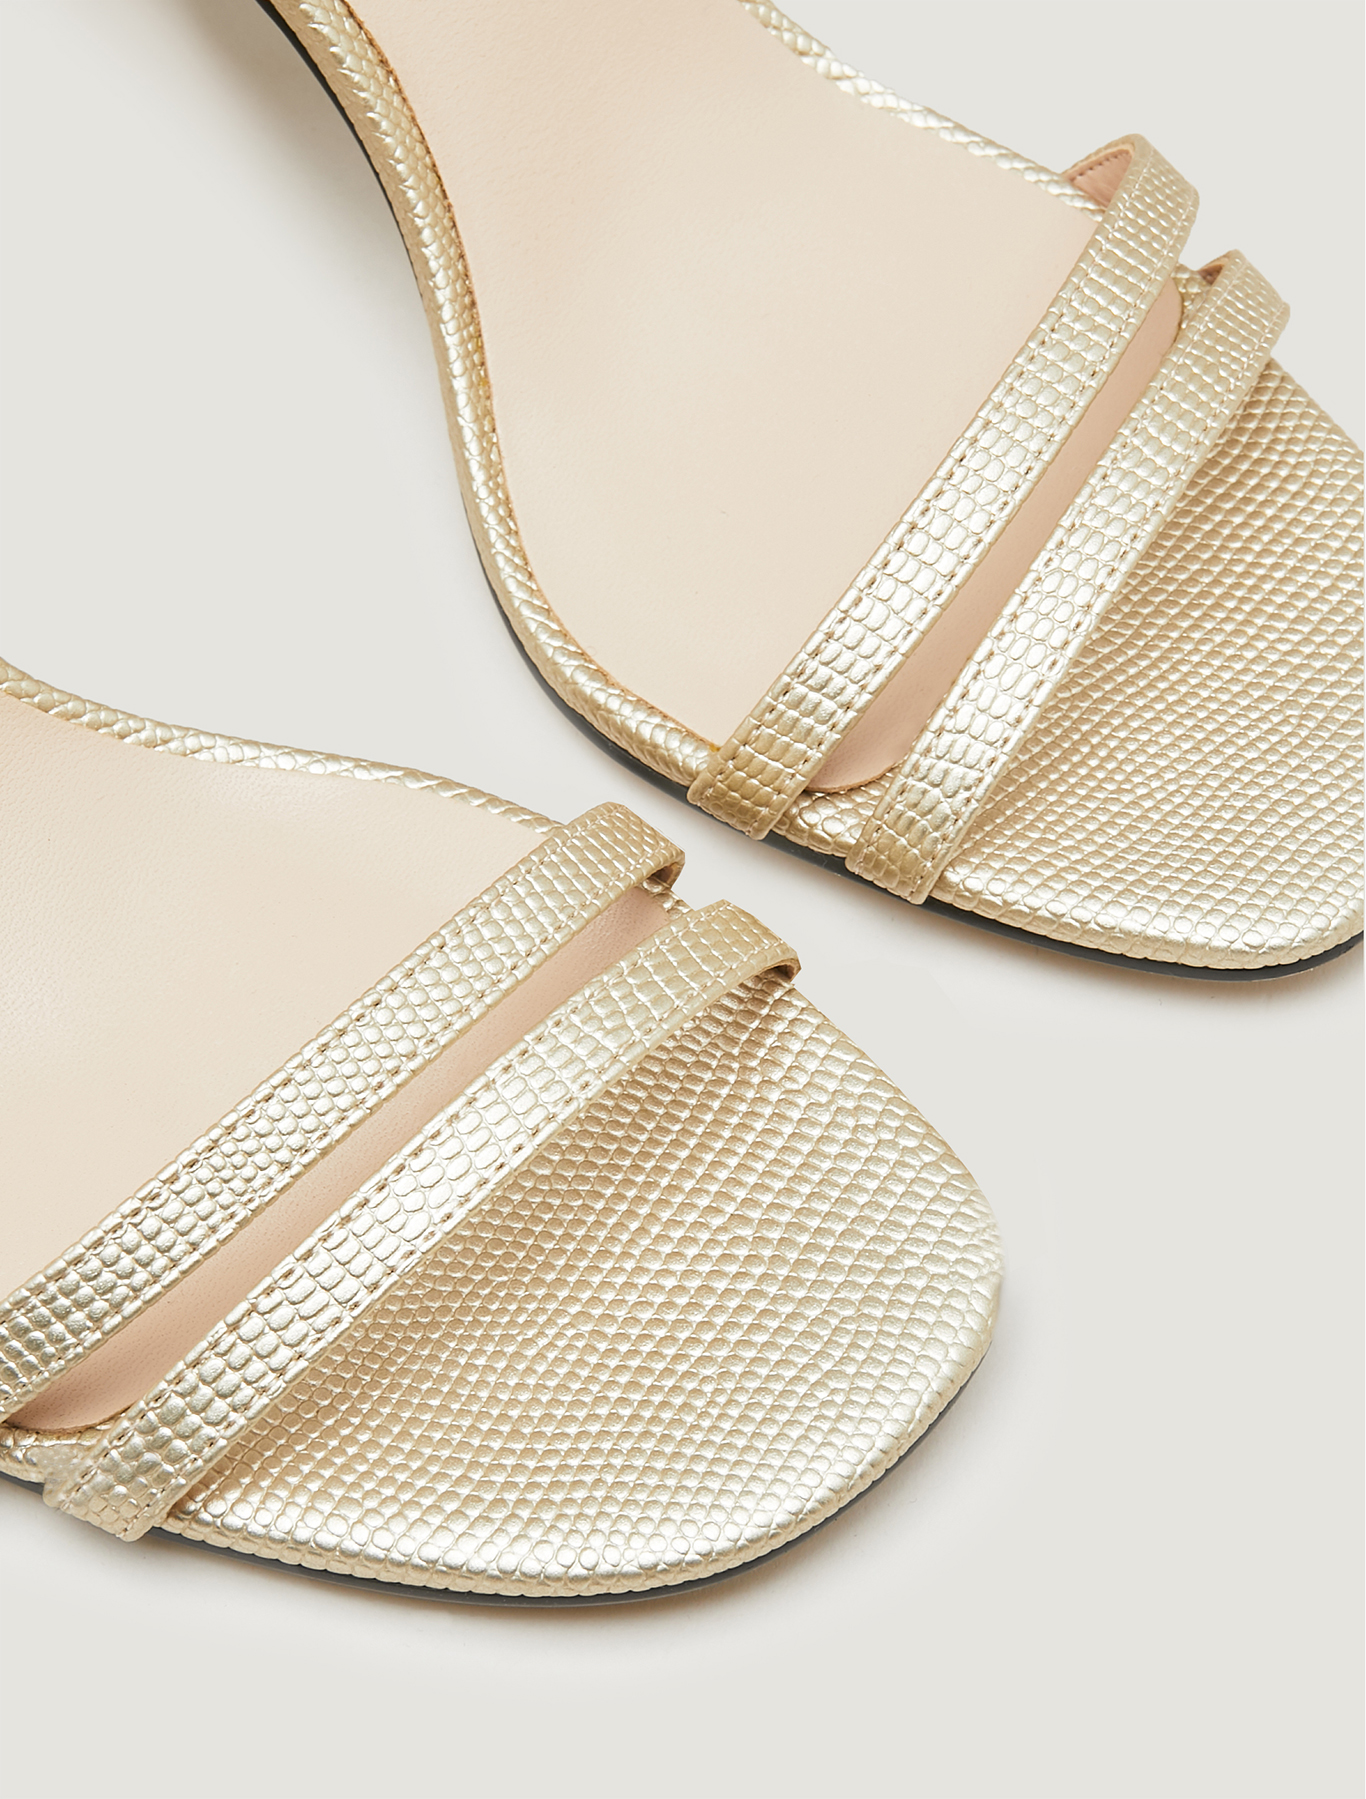 Lizard-print high-heeled sandals - sunshine yellow - pennyblack